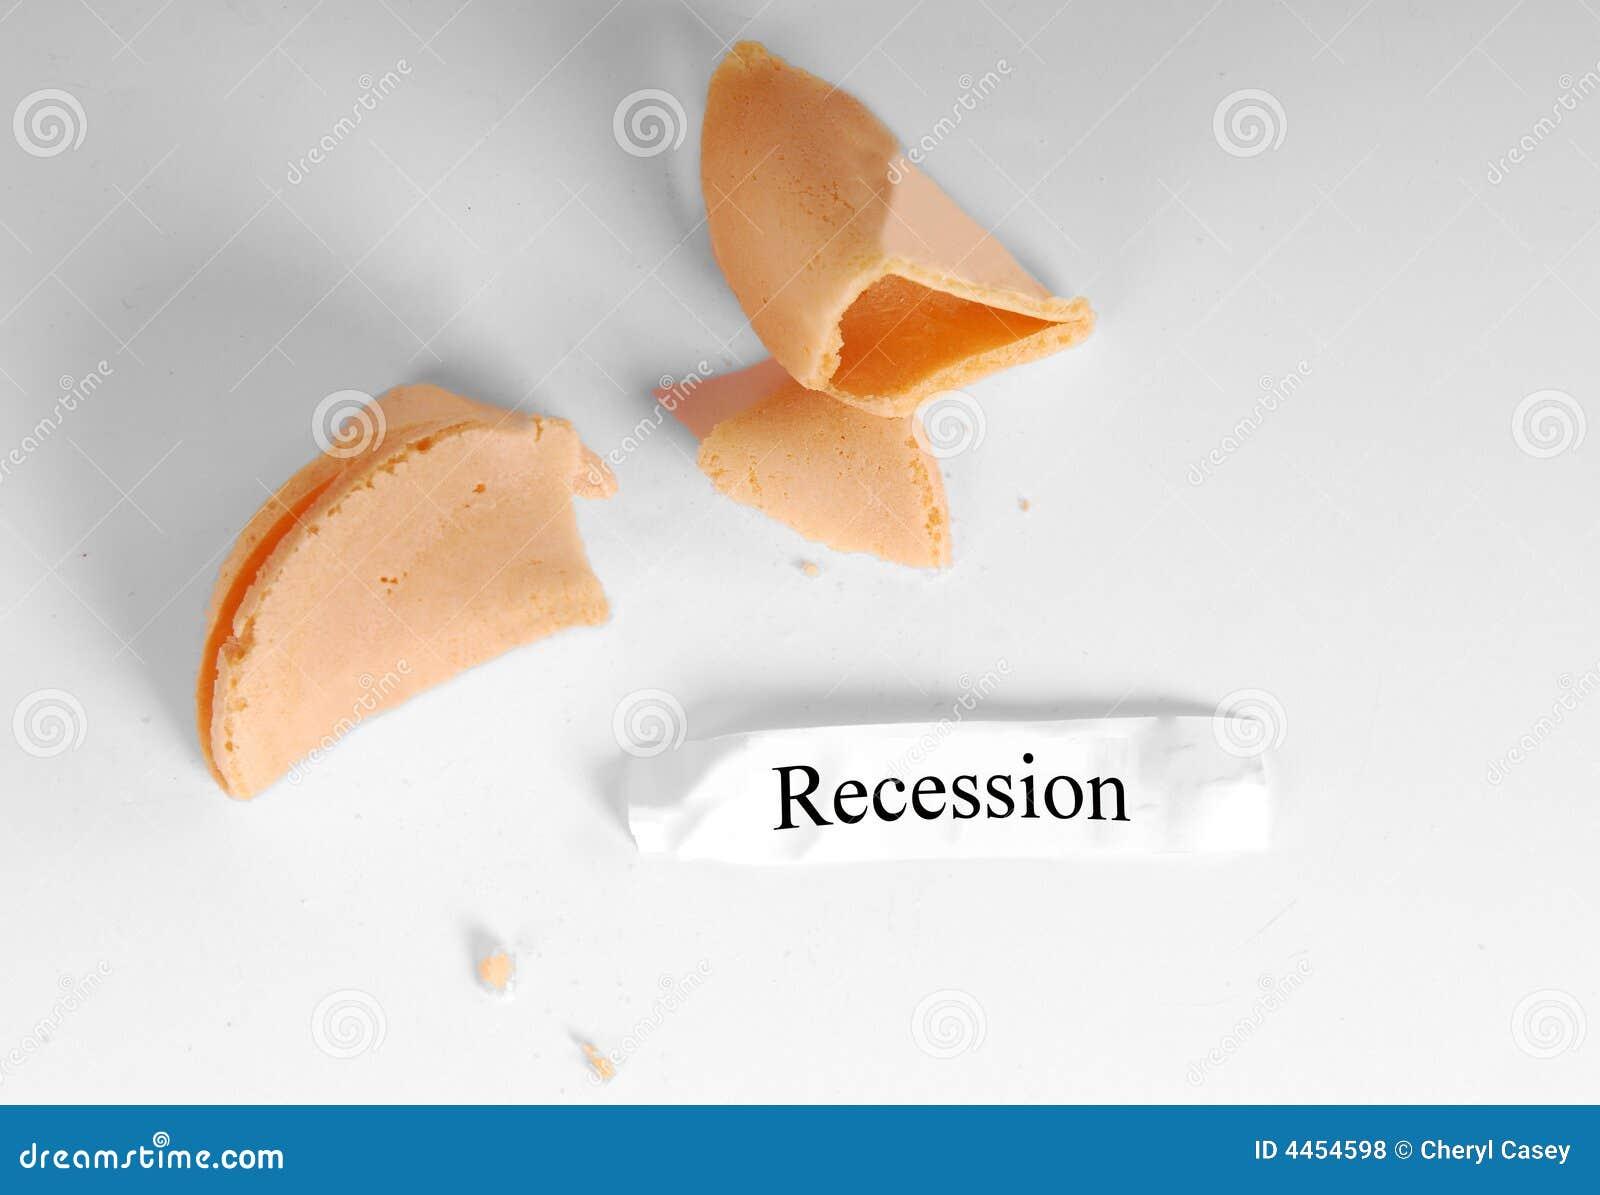 Recessione in biscotto di fortuna